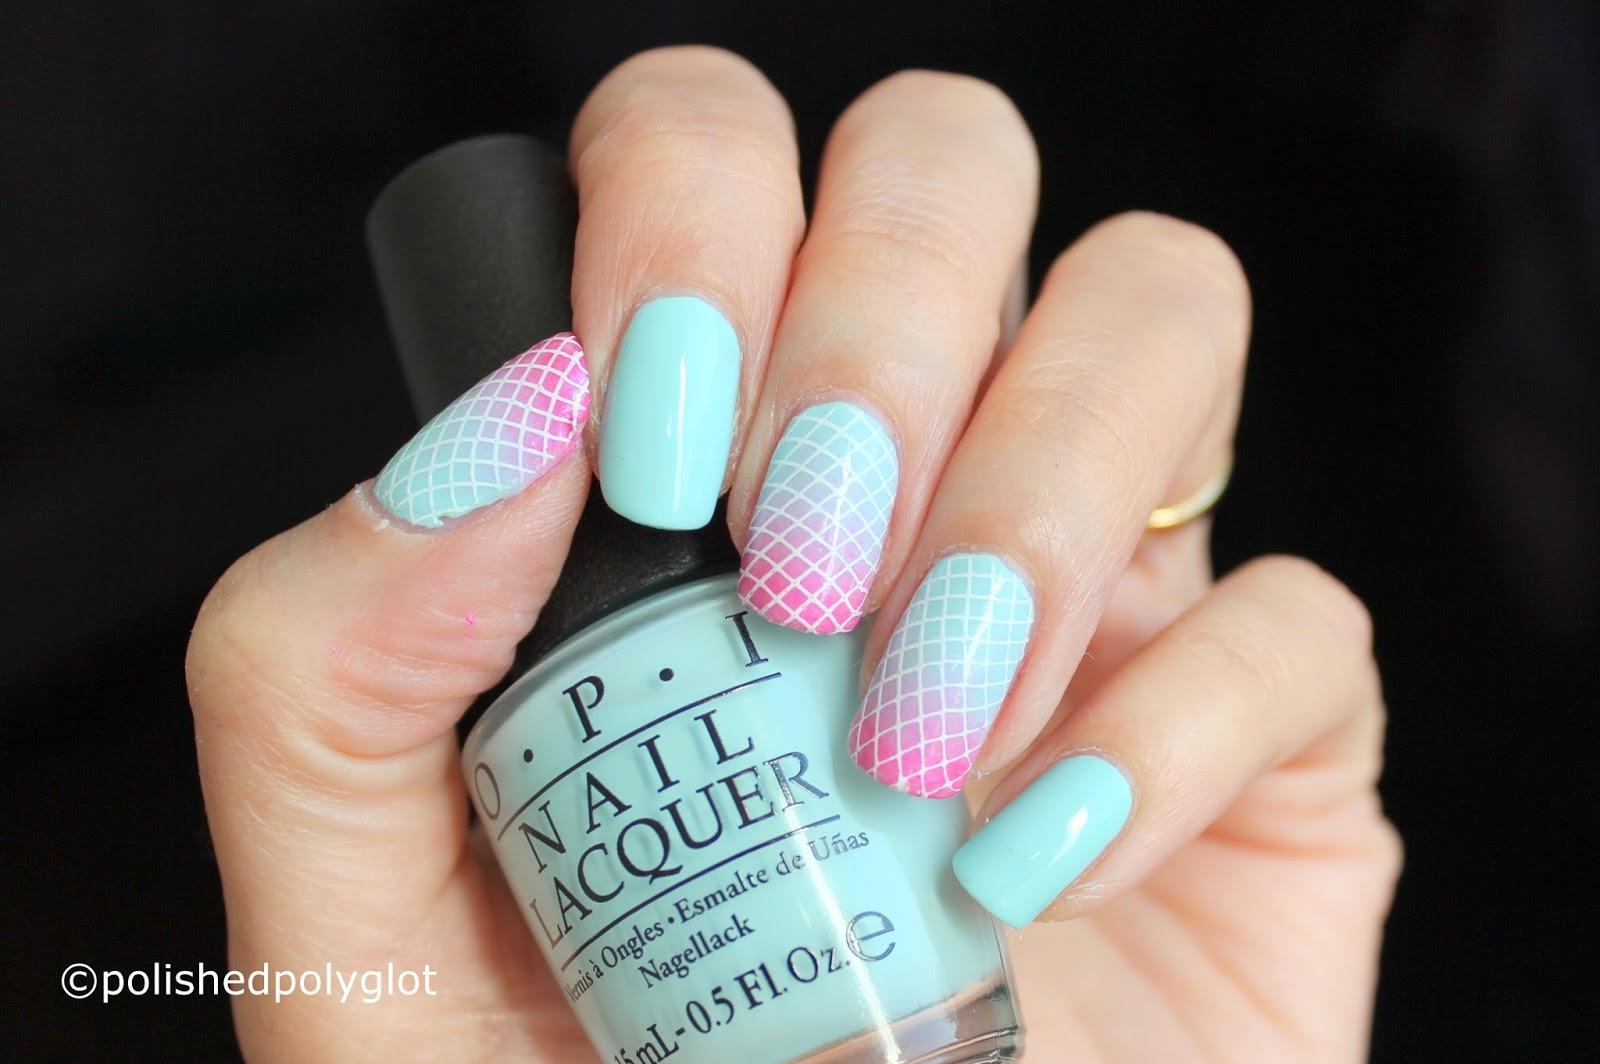 Nail art │ Pastel & bold nails for Spring [26GNAI] / Polished Polyglot